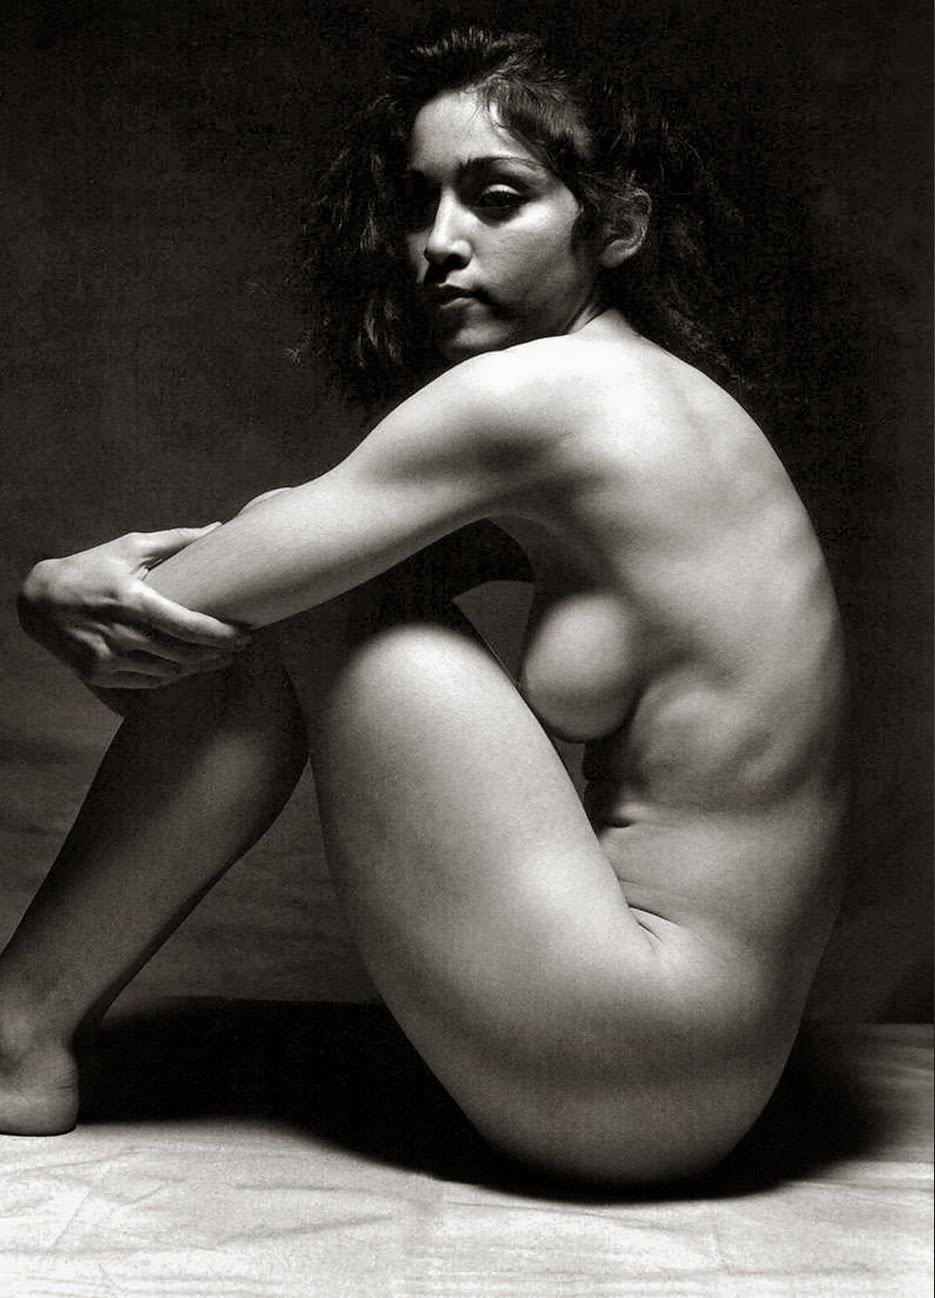 Fotograf As Art Sticas Desnudos Femeninos Arte Enblanco Y Negro